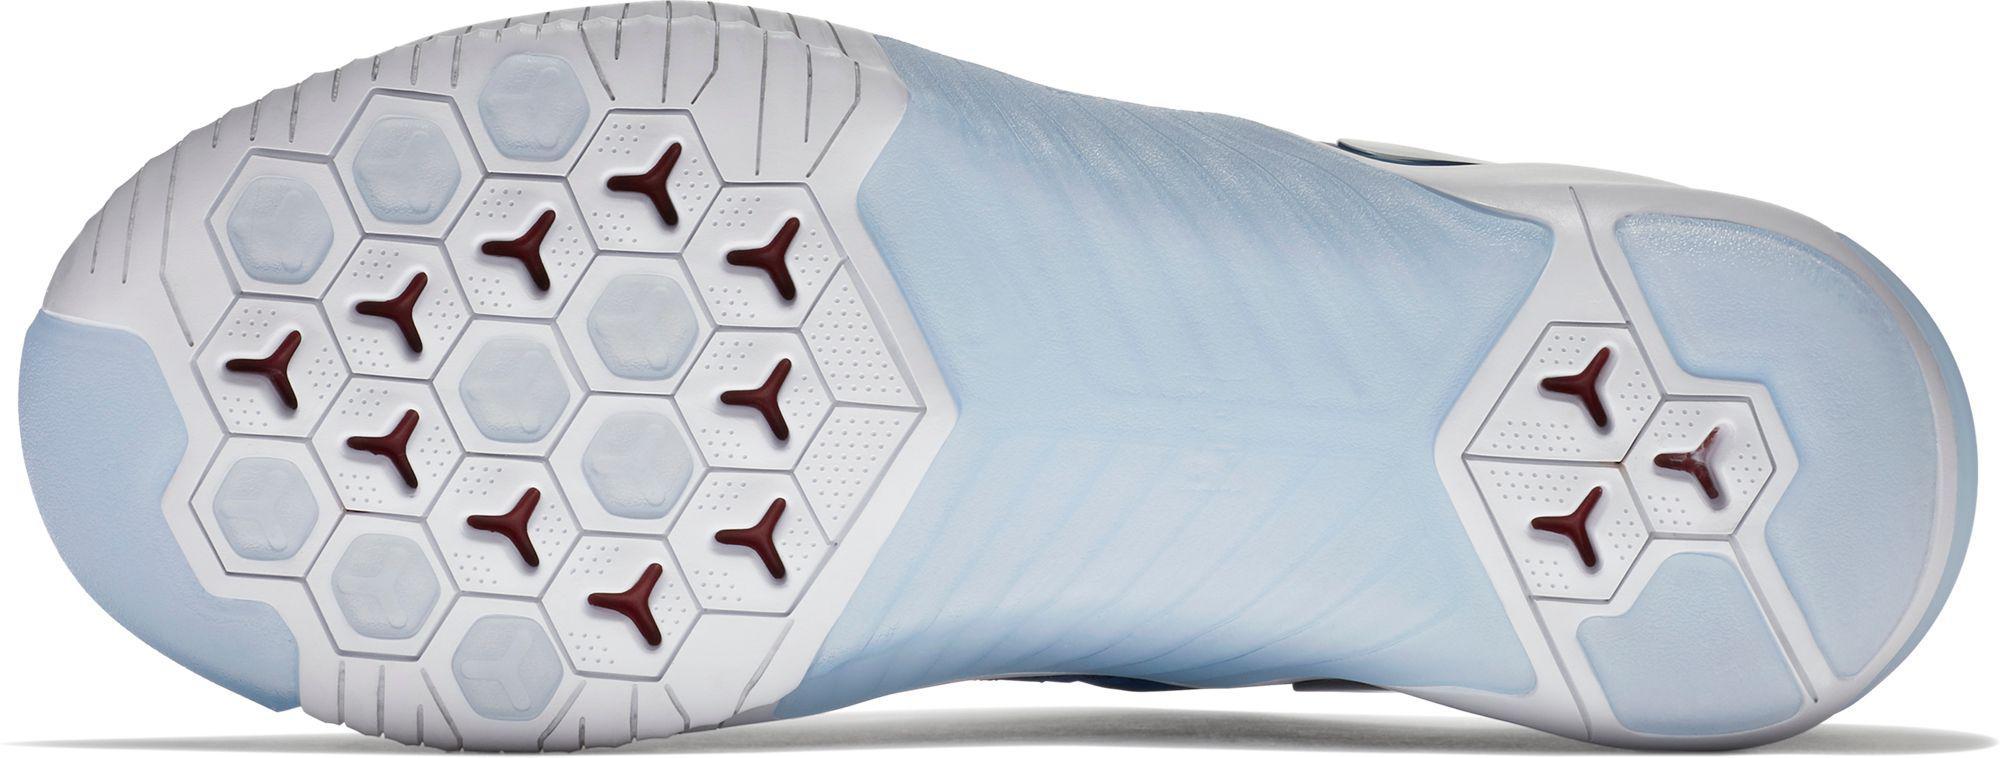 8ba5e2e5c41 Lyst - Nike Free X Metcon Americana Training Shoes in Blue for Men